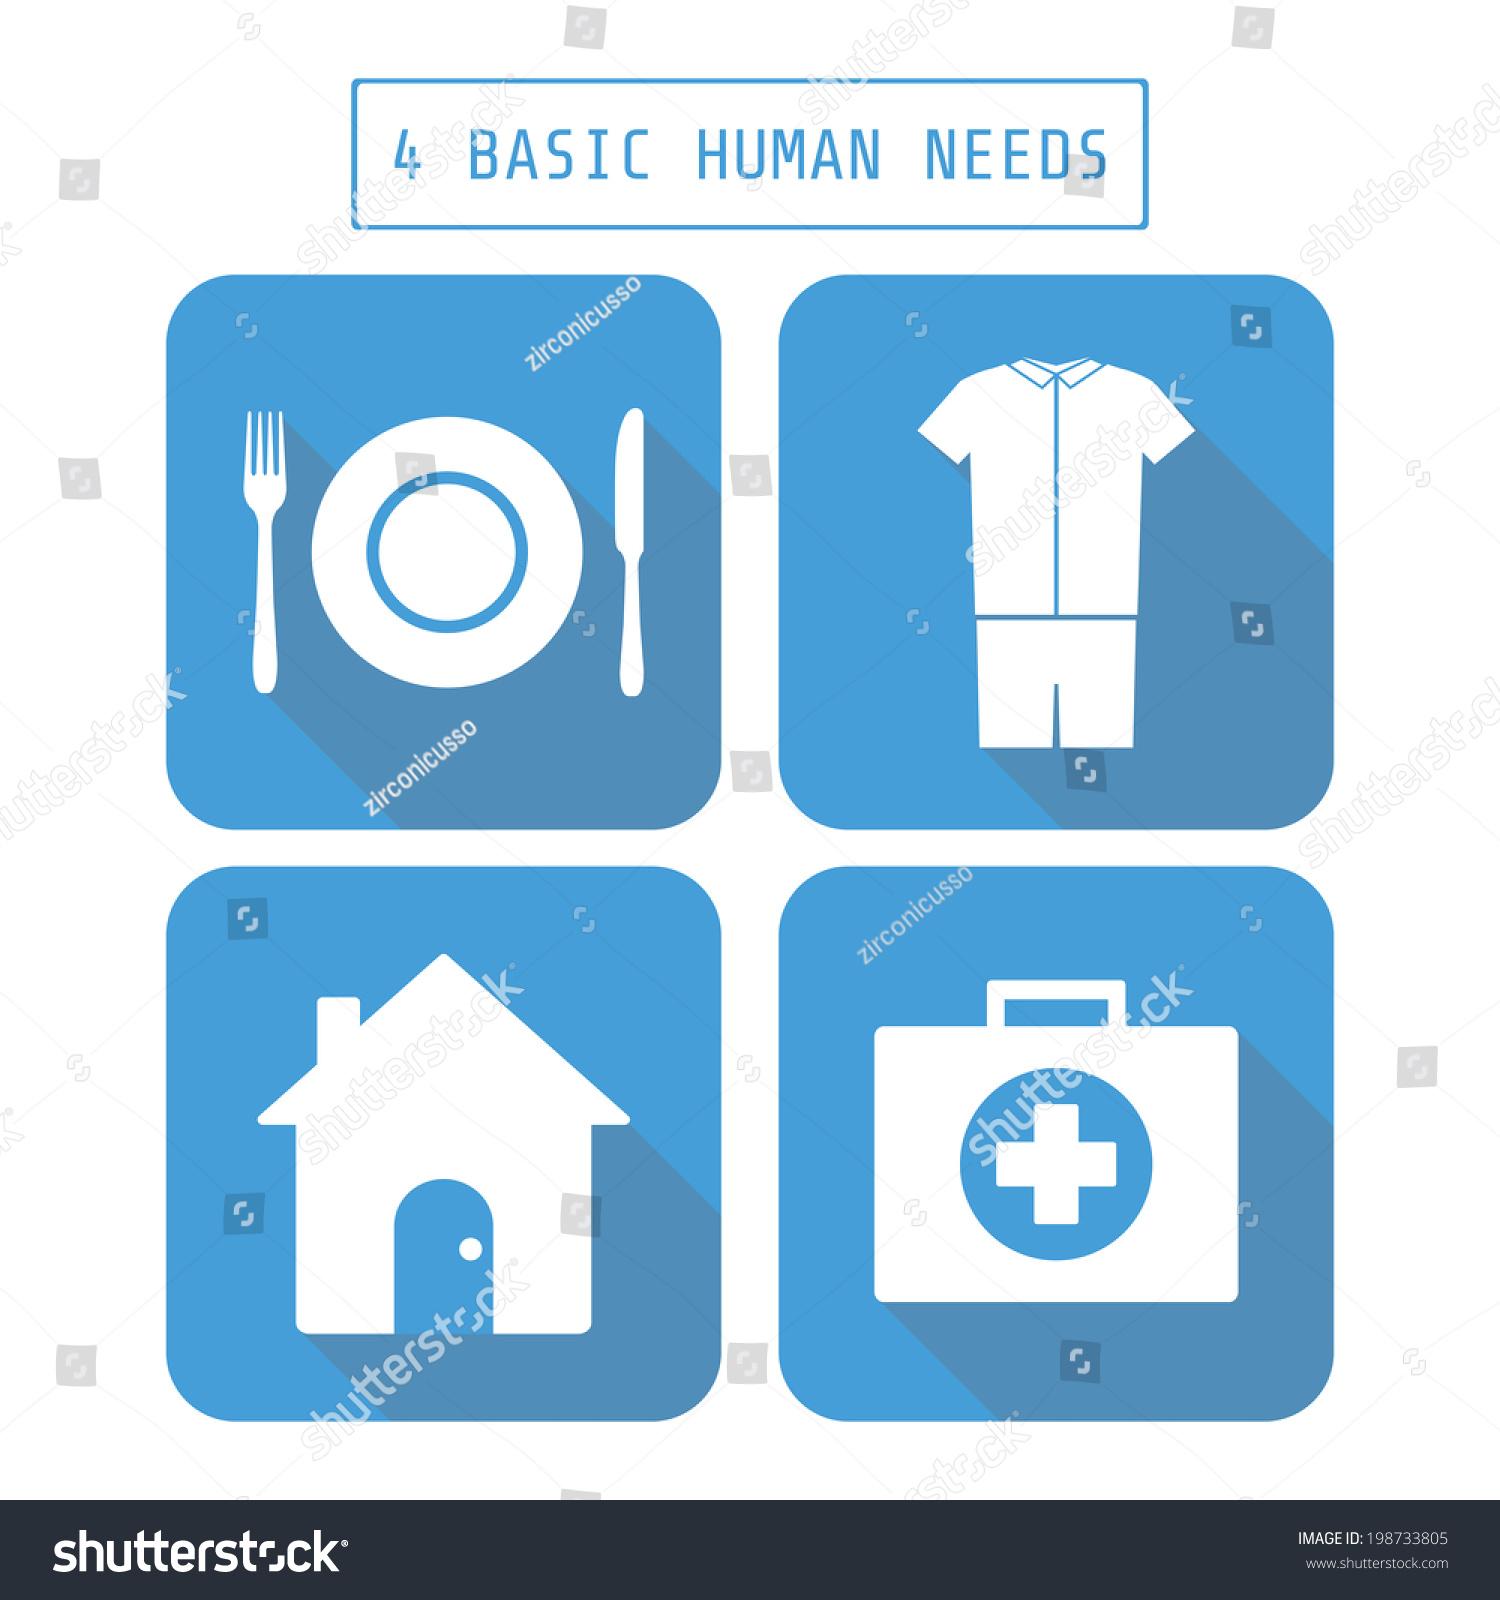 Icon Four Basic Human Needs Flat Stock Vector